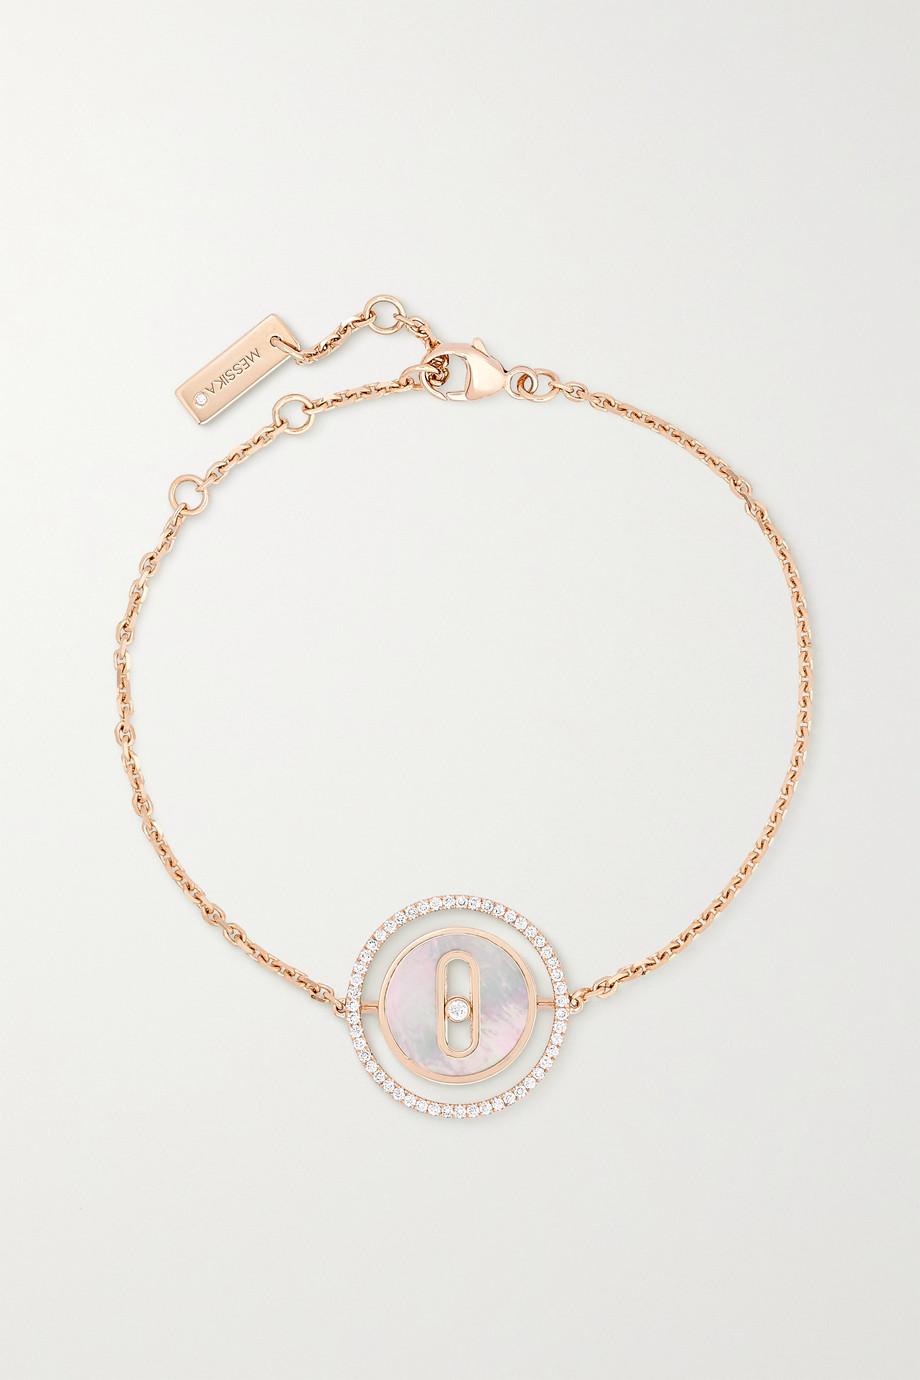 Messika Lucky Move Armband aus 18 Karat Roségold, Perlmutt und Diamanten